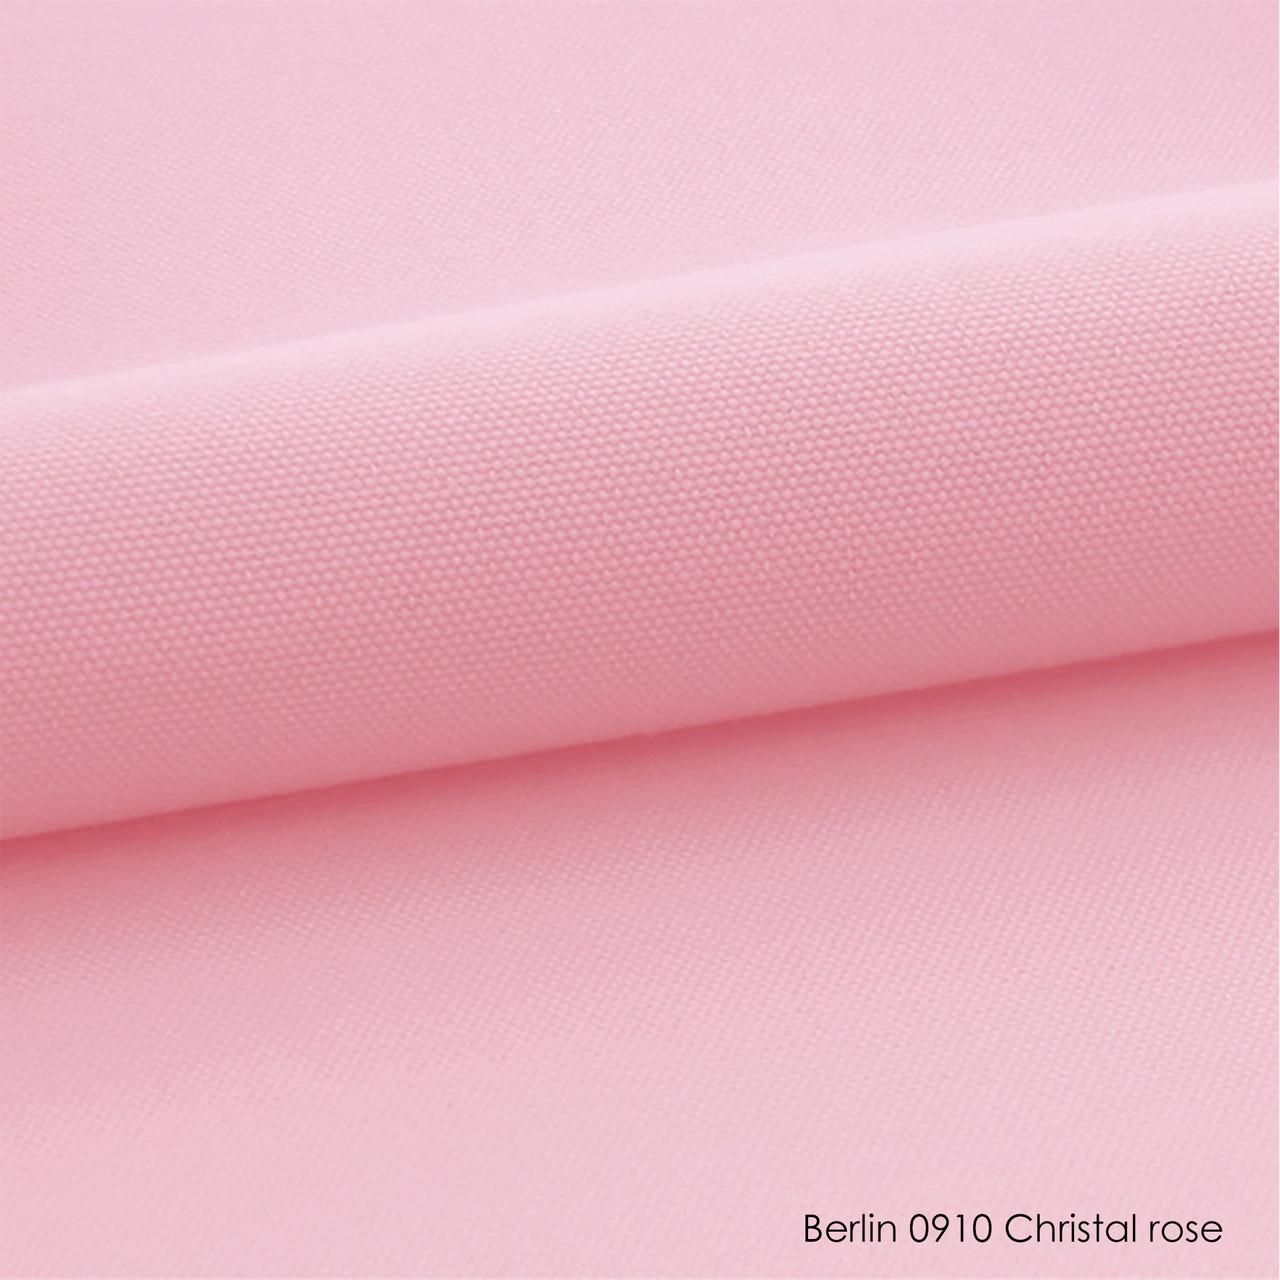 Ролеты тканевые Berlin 0910 christal rose